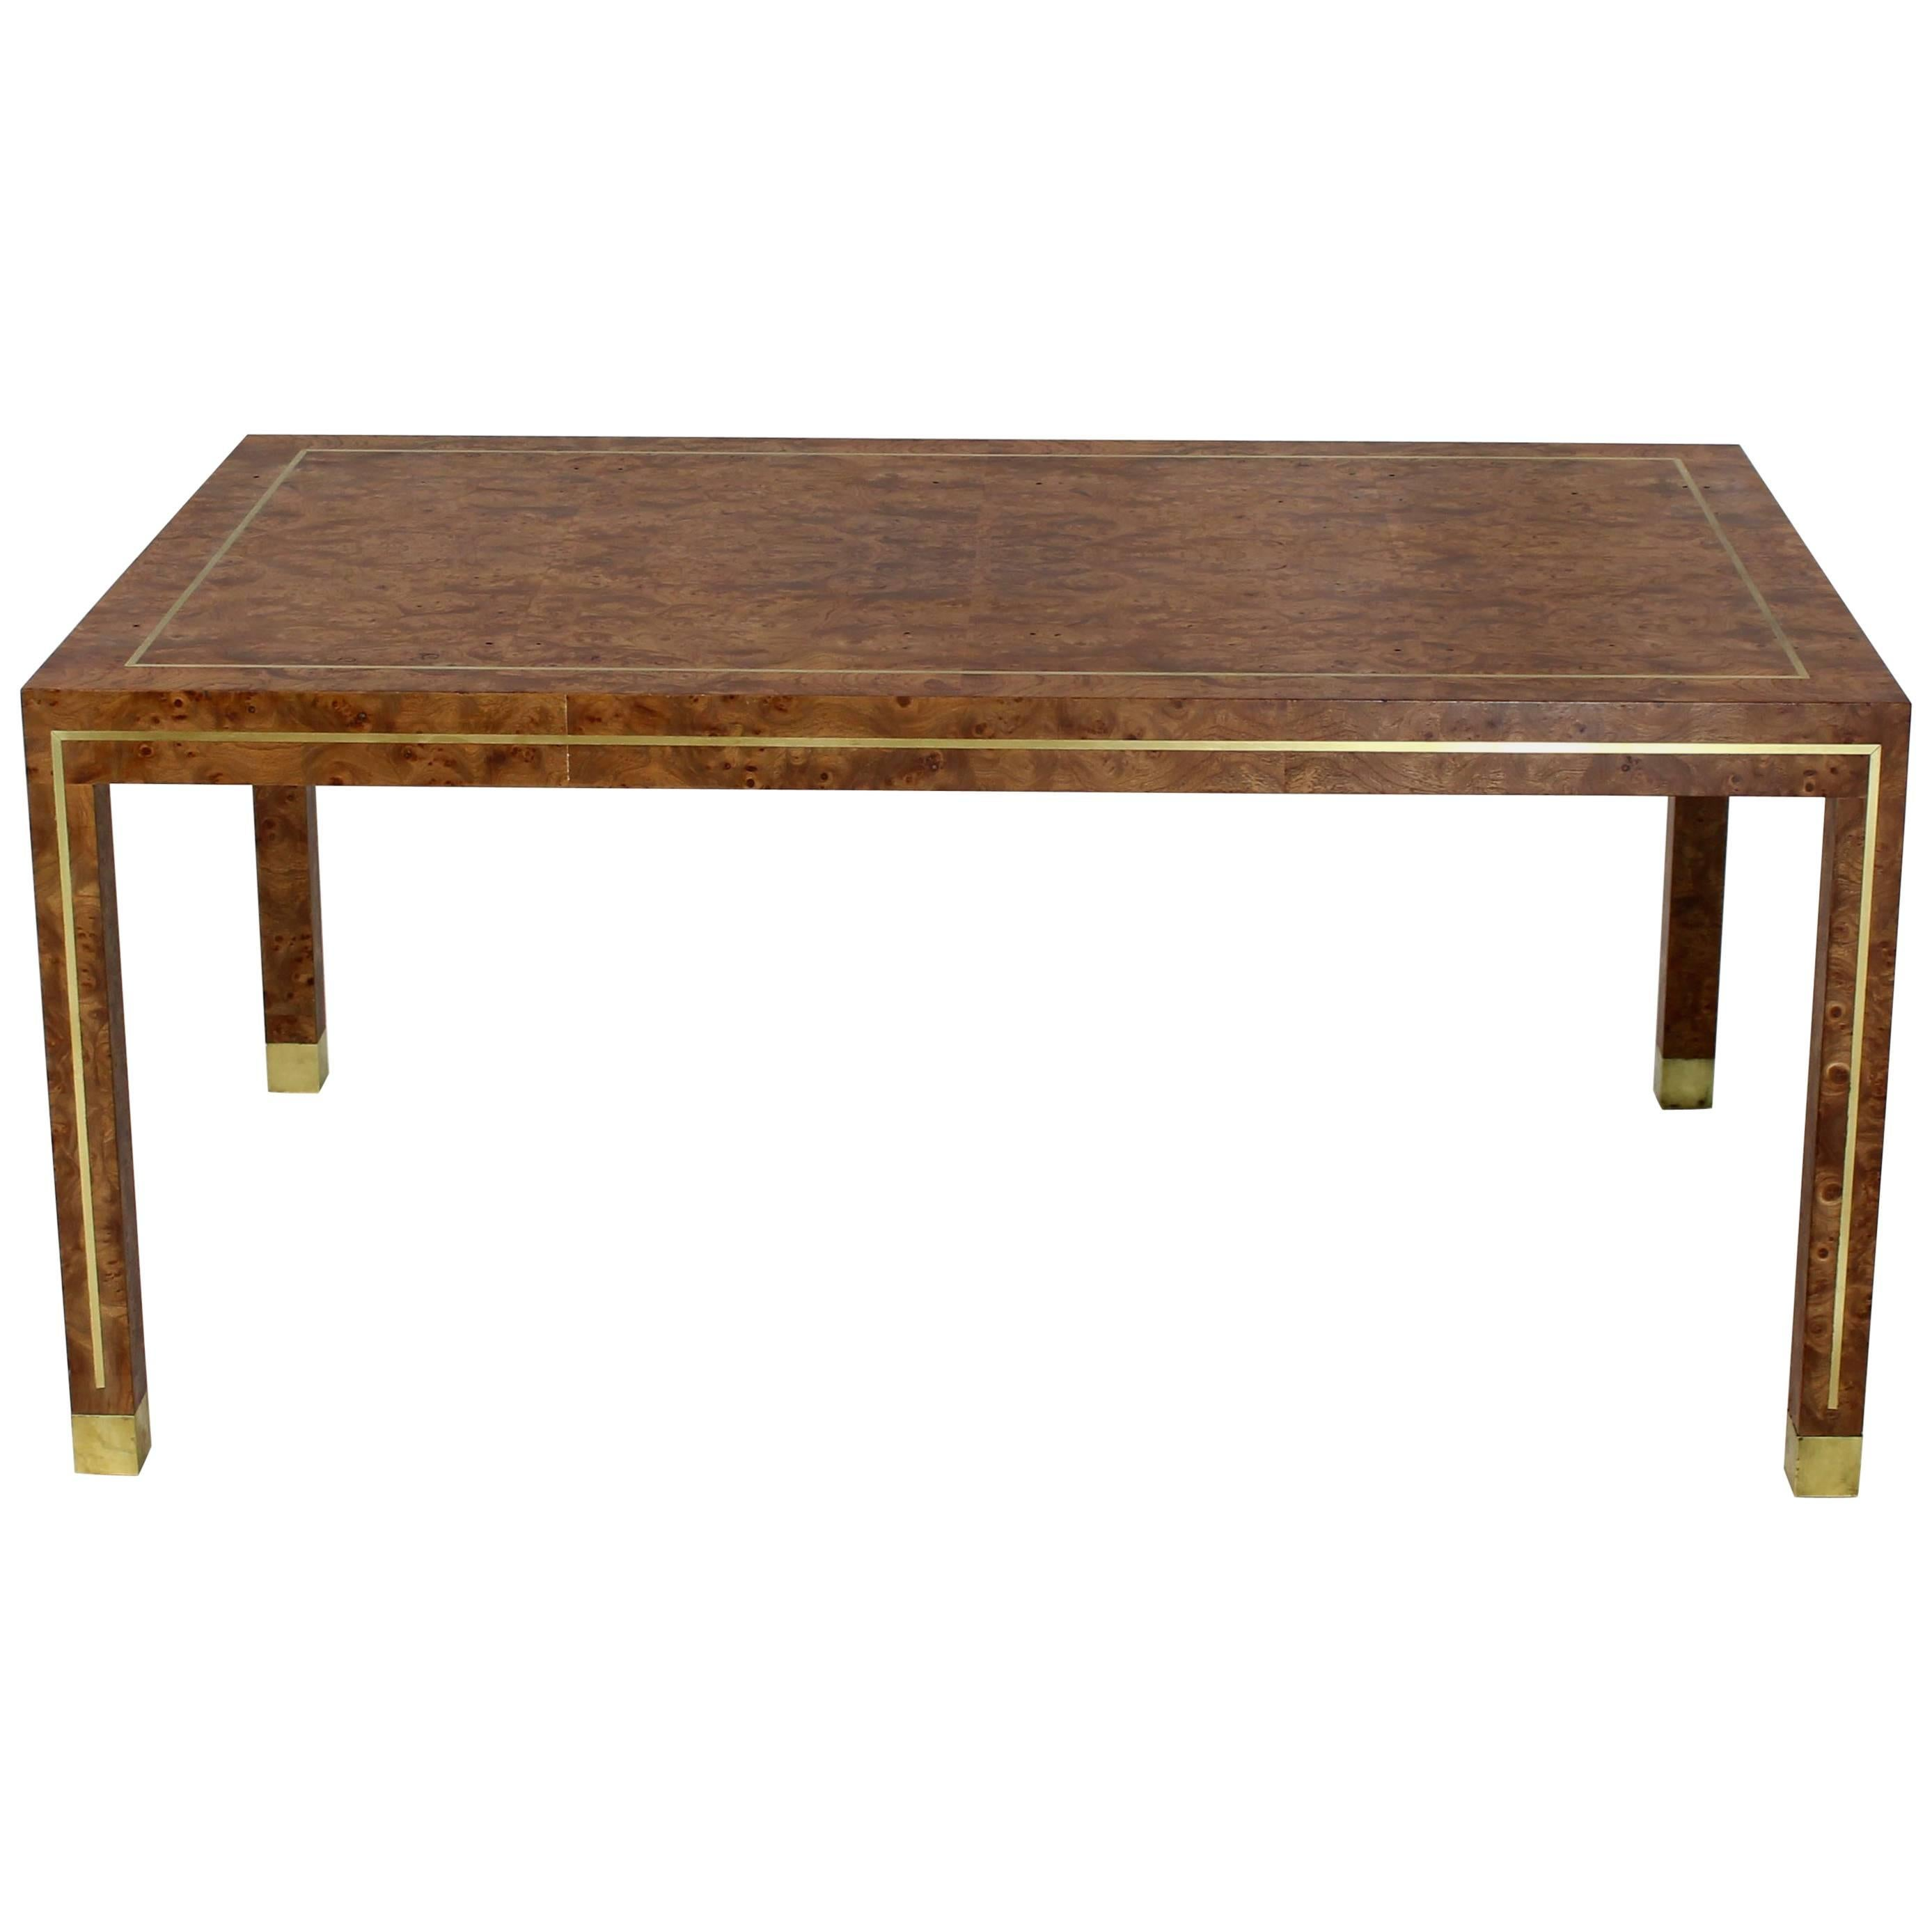 Brass Inlay Burl Wood Large Rectangular Coffee Table